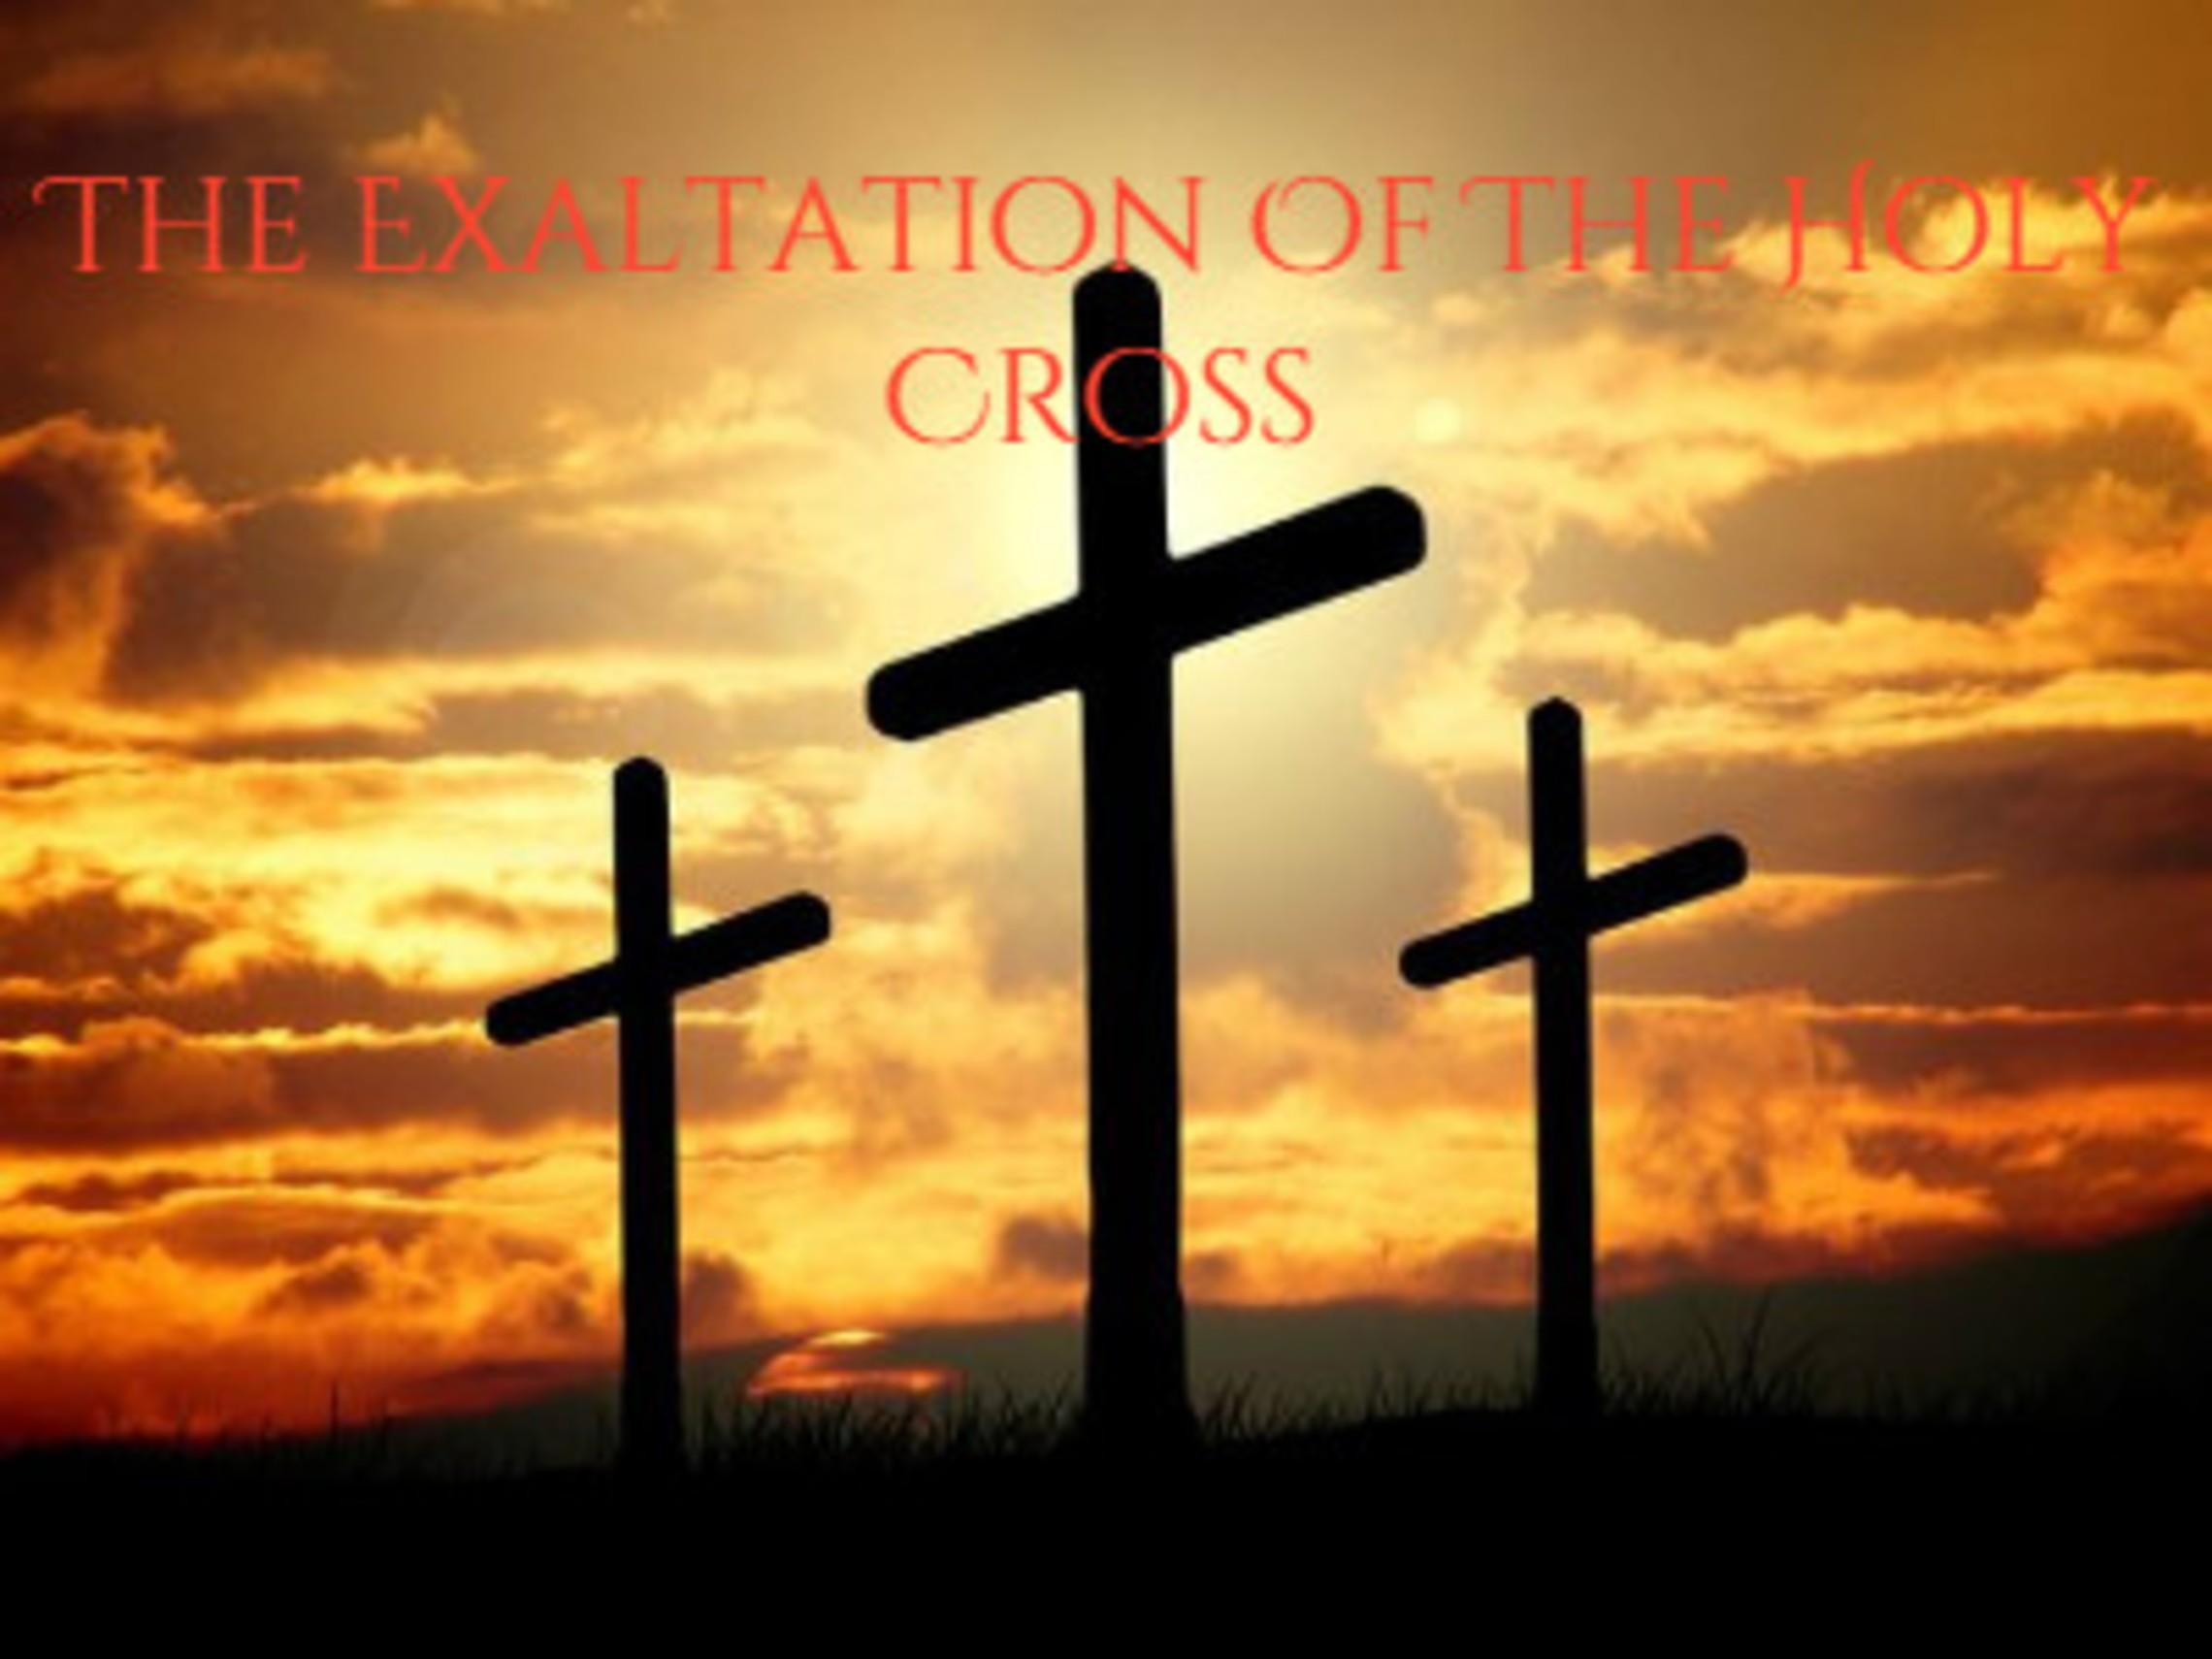 3 Crosses Tn